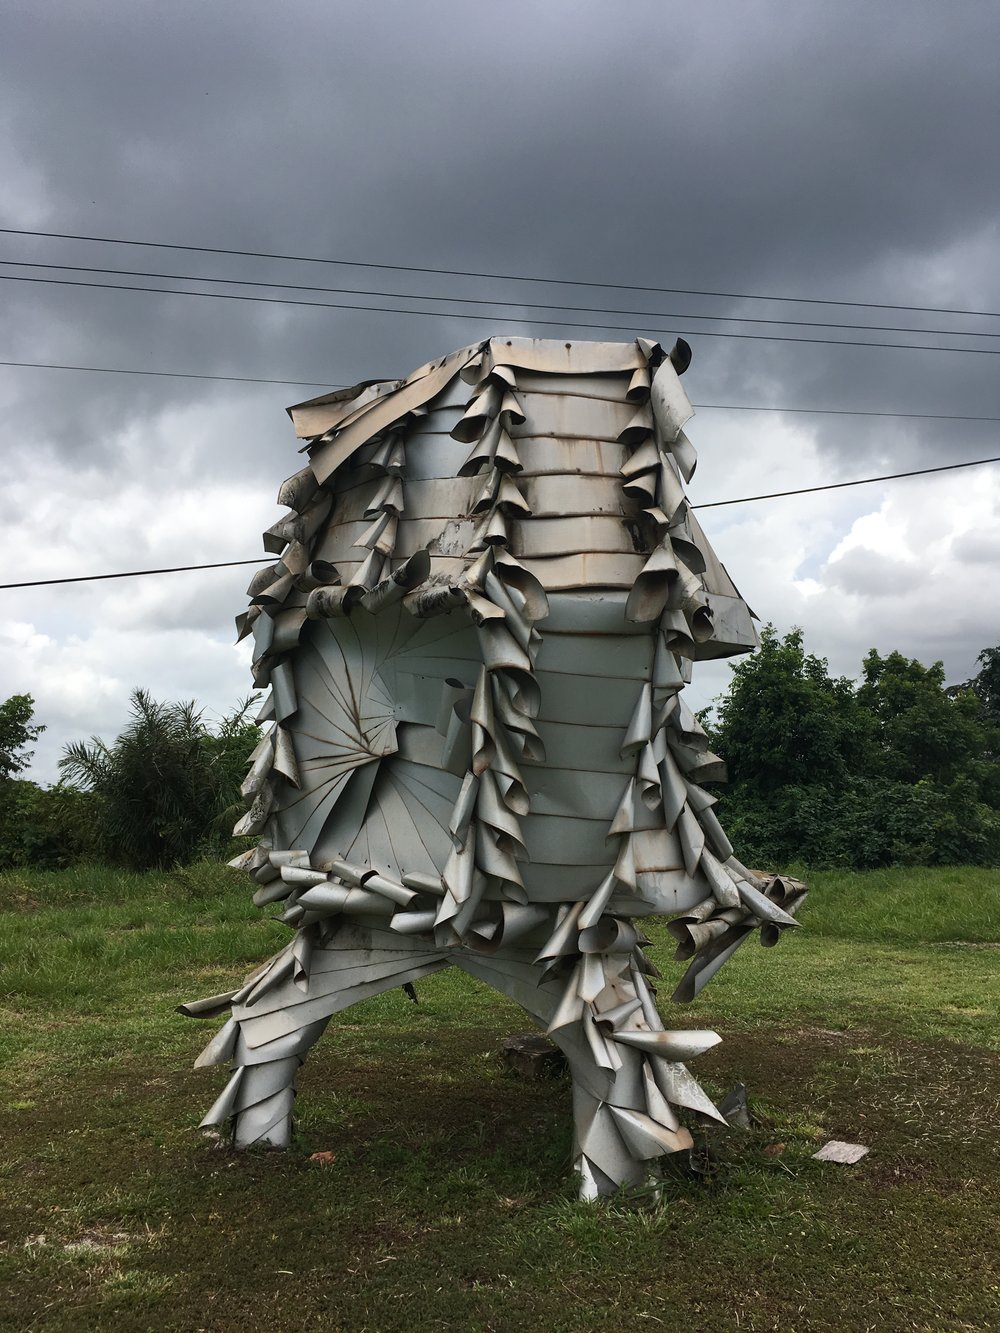 Work by Netherlands-based Surinamese artist, Charl Landvreugd.